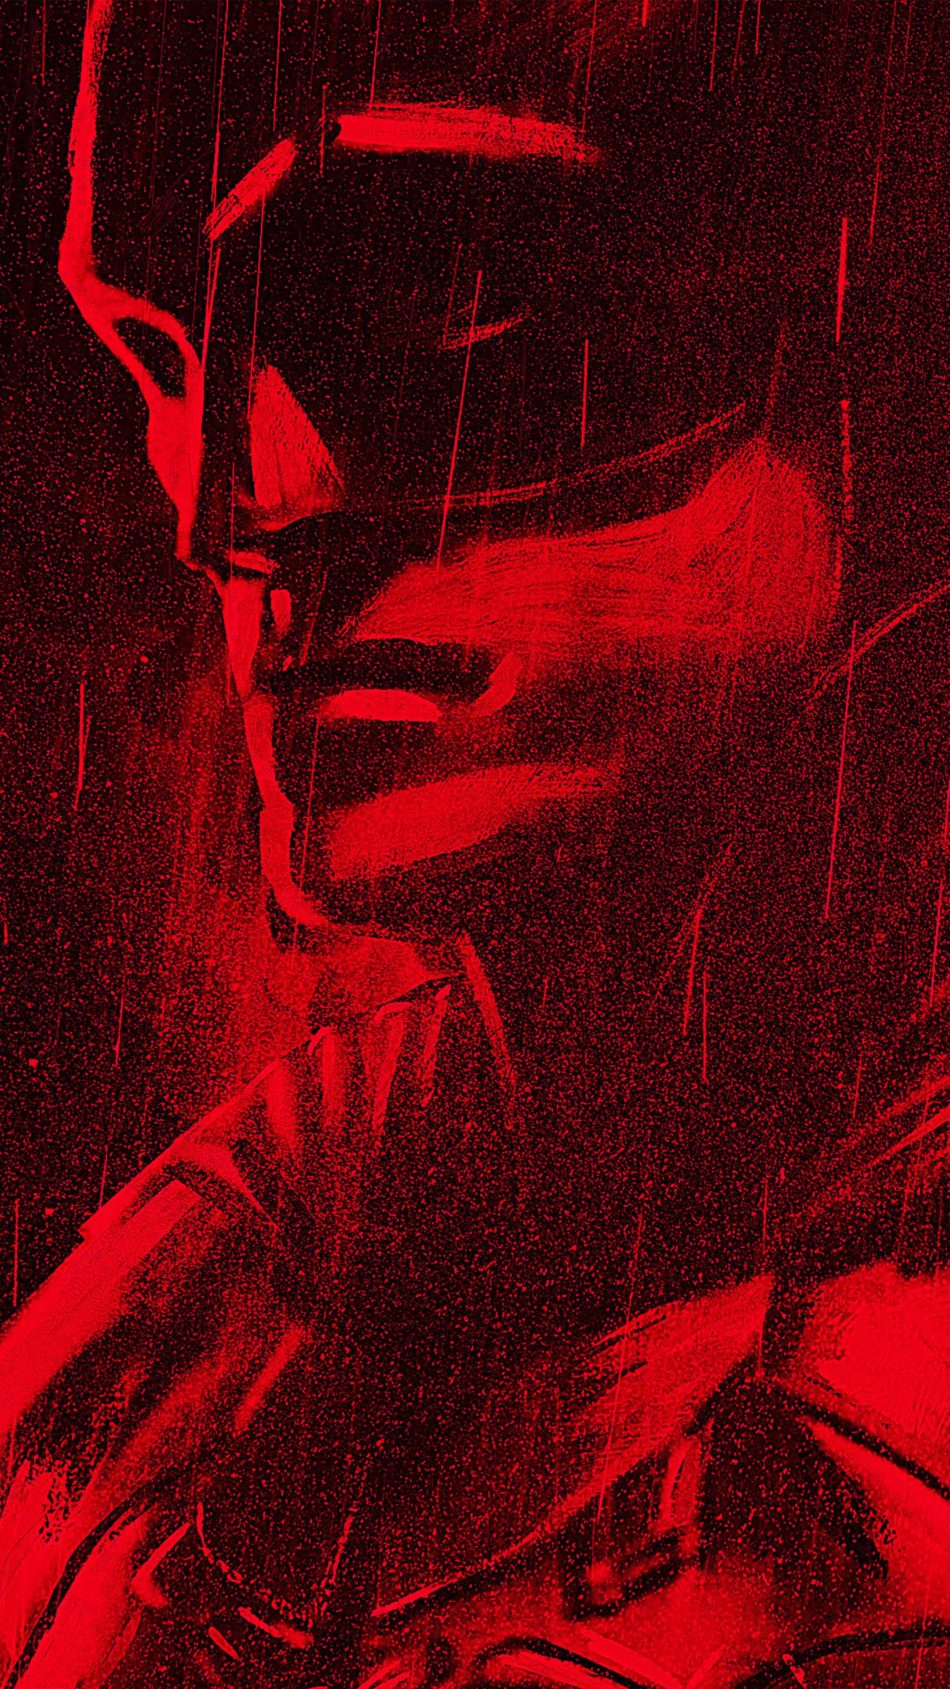 Batman 2021 Poster New 4K Ultra HD Mobile Wallpaper